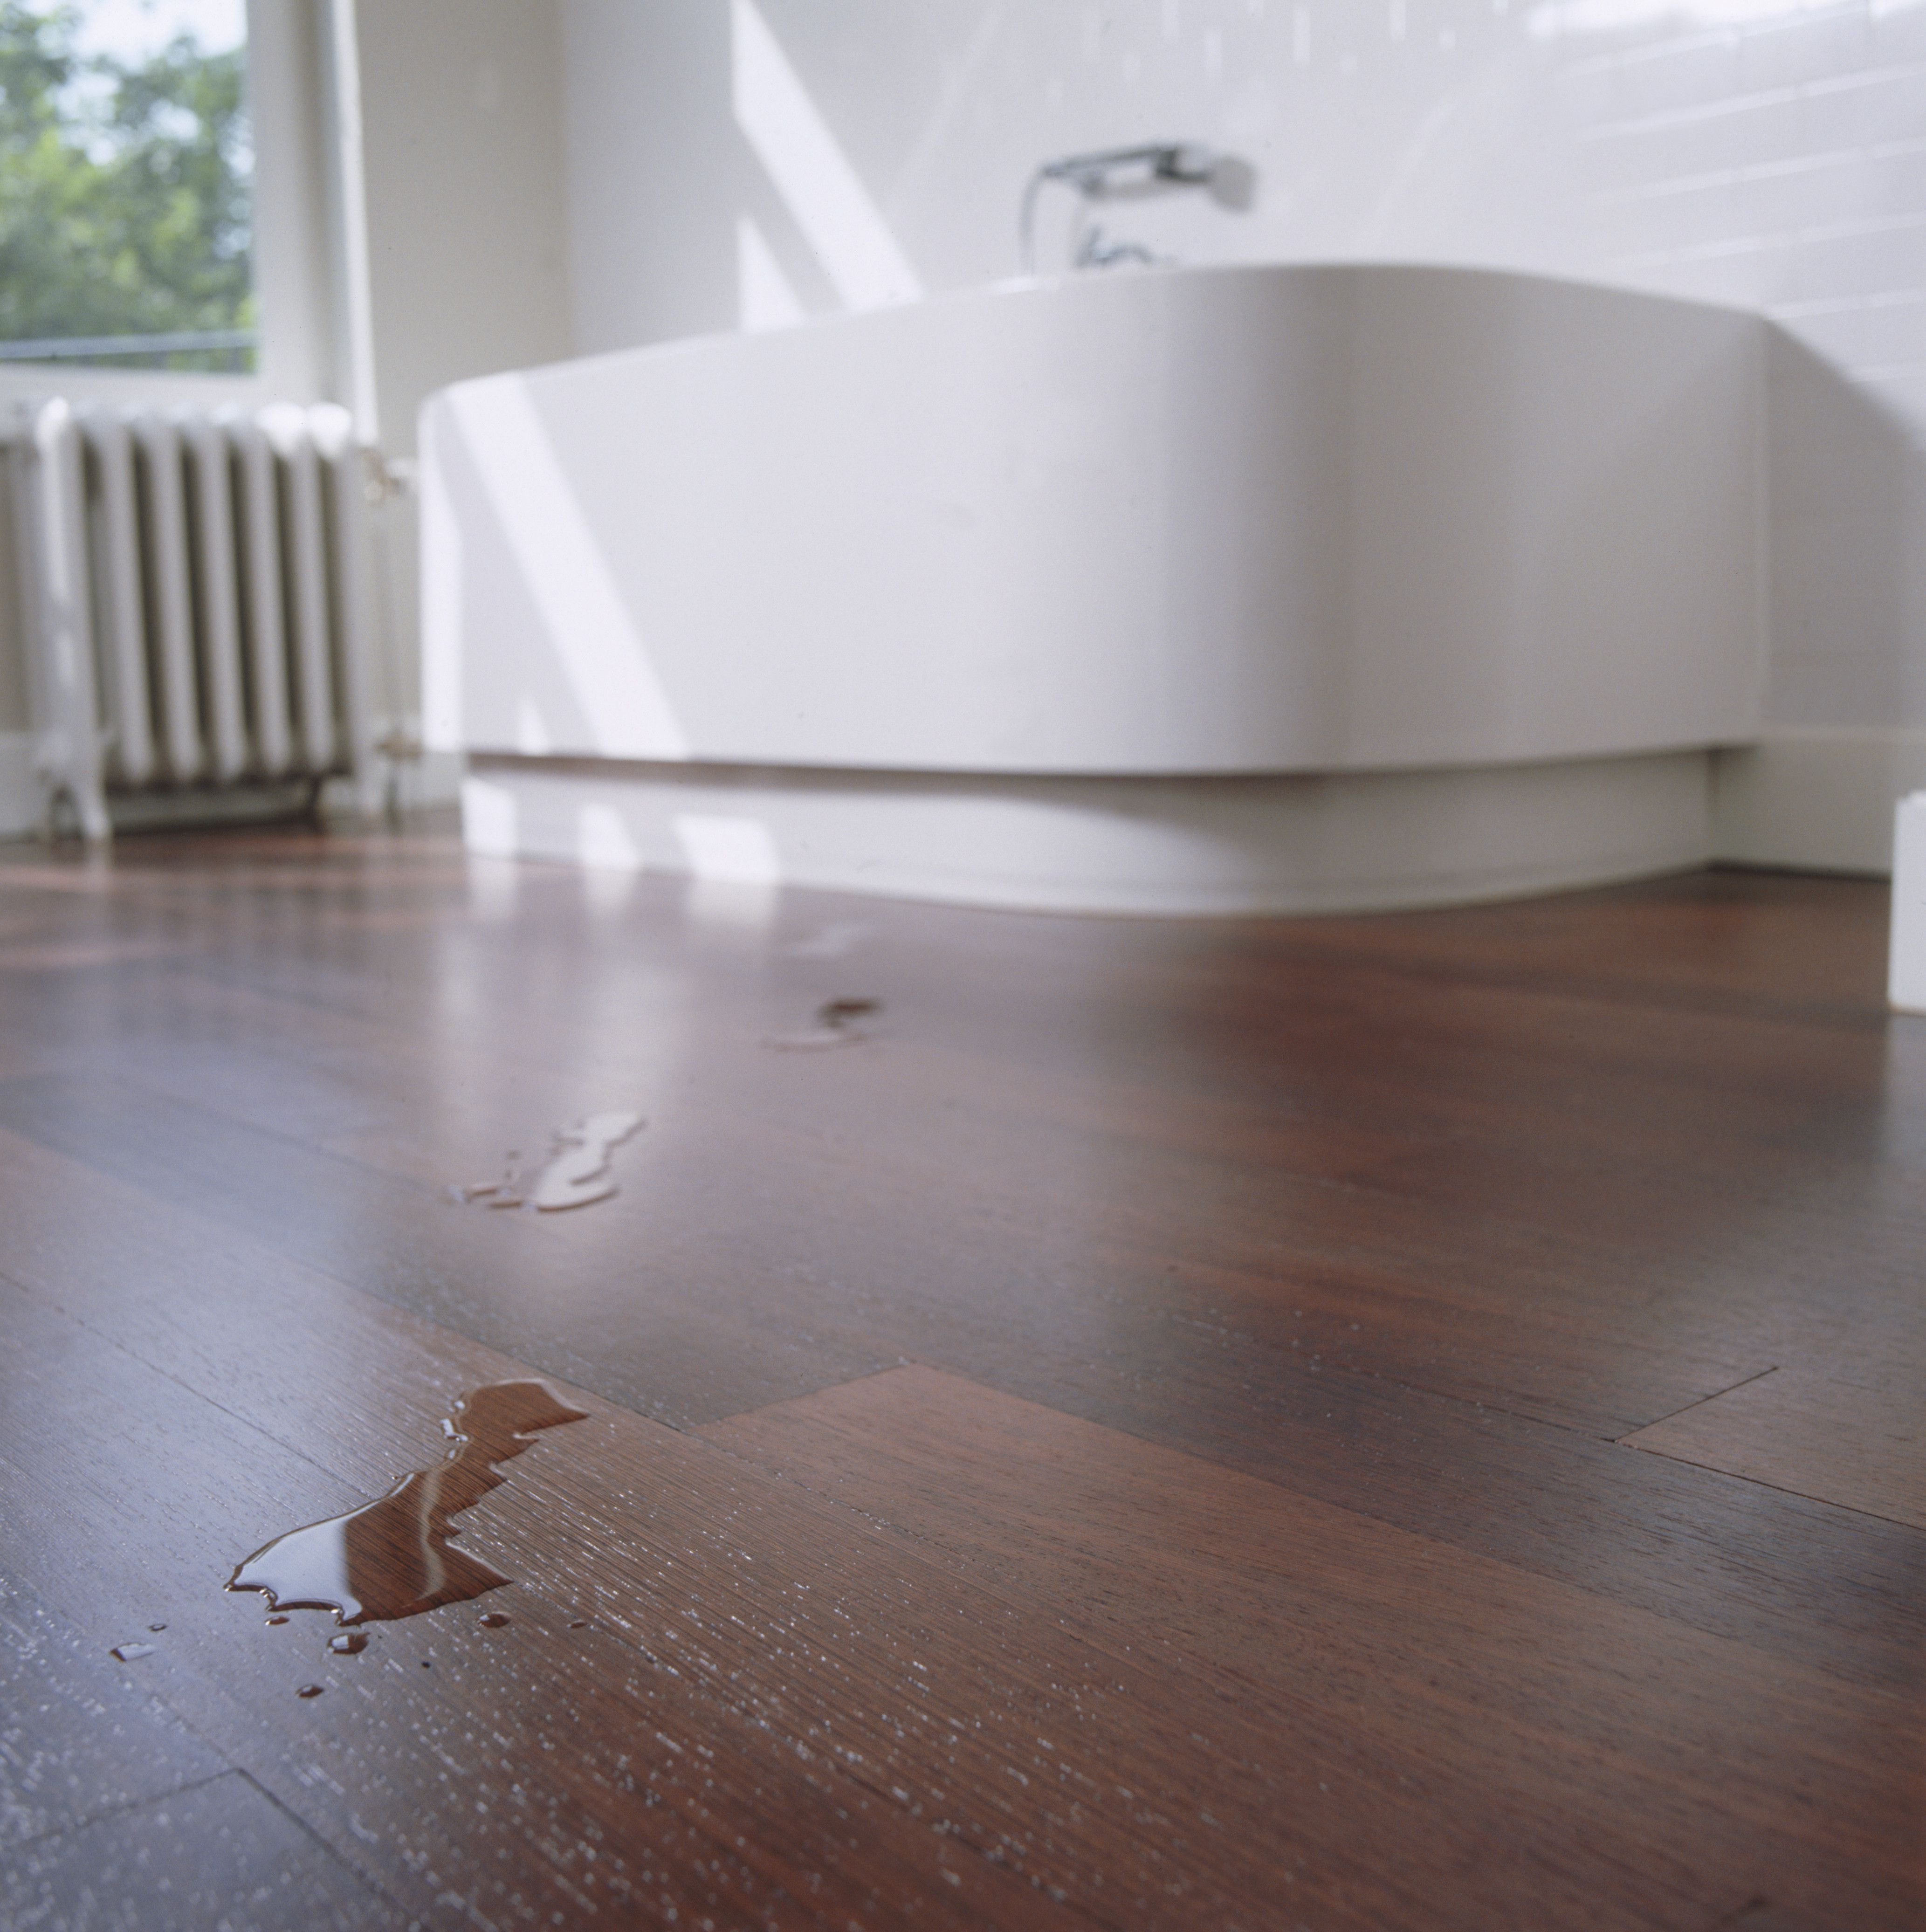 Hardwood Flooring Over Ceramic Tile Of Hardwood Flooring for Bathrooms What to Consider Throughout Hardwoodbathroom 588f341e3df78caebccc9ec2